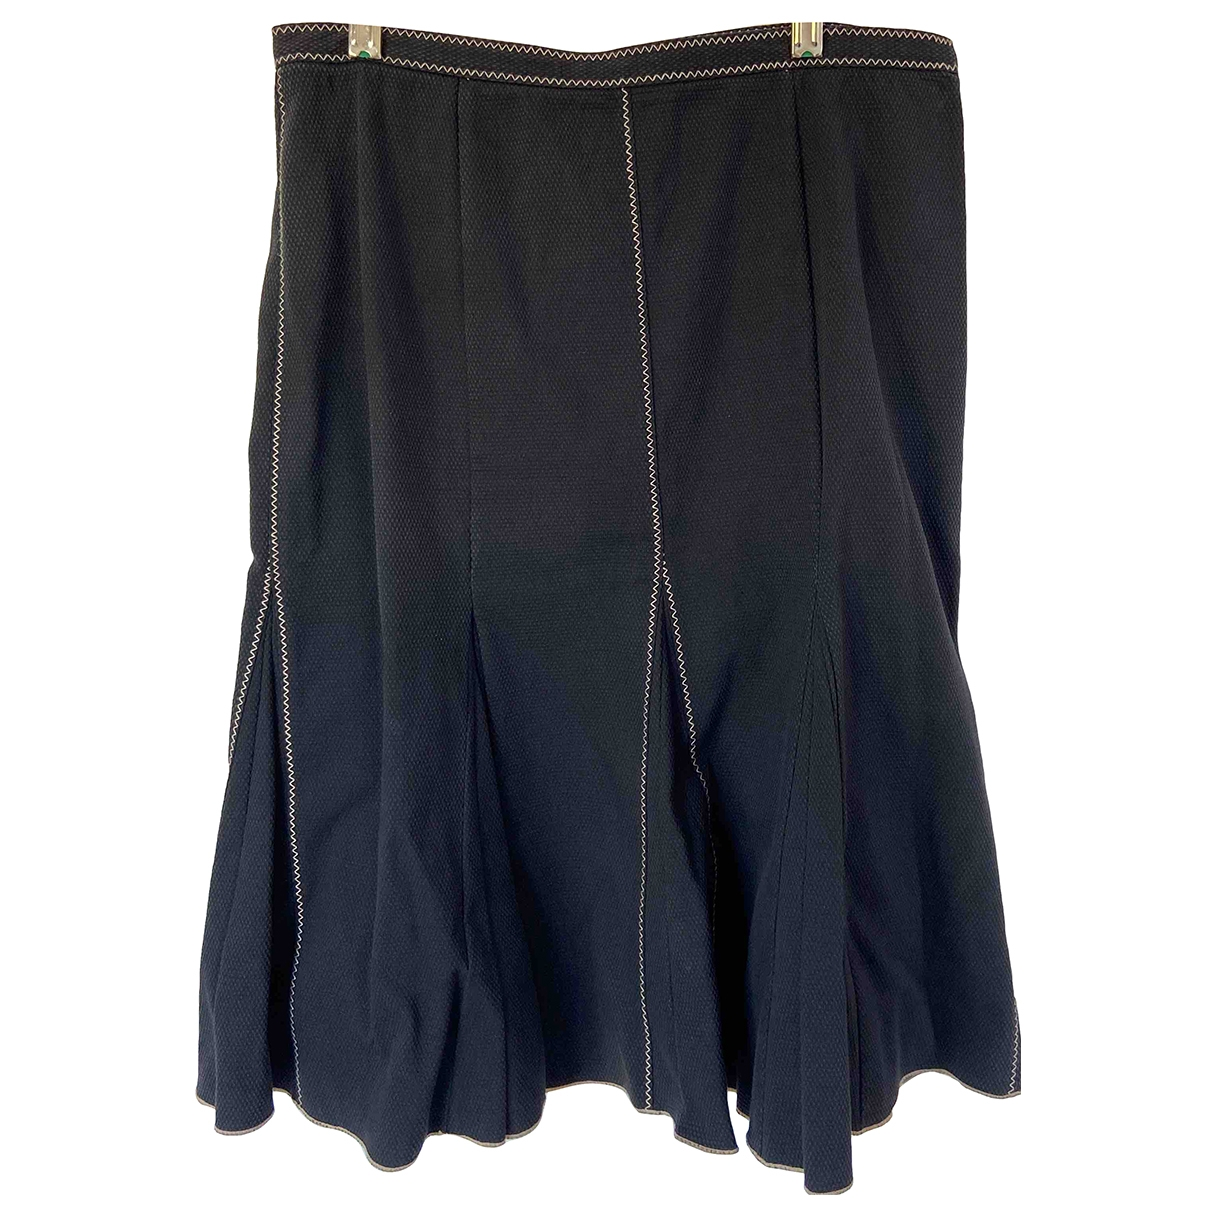 Paule Ka - Jupe   pour femme en coton - elasthane - noir